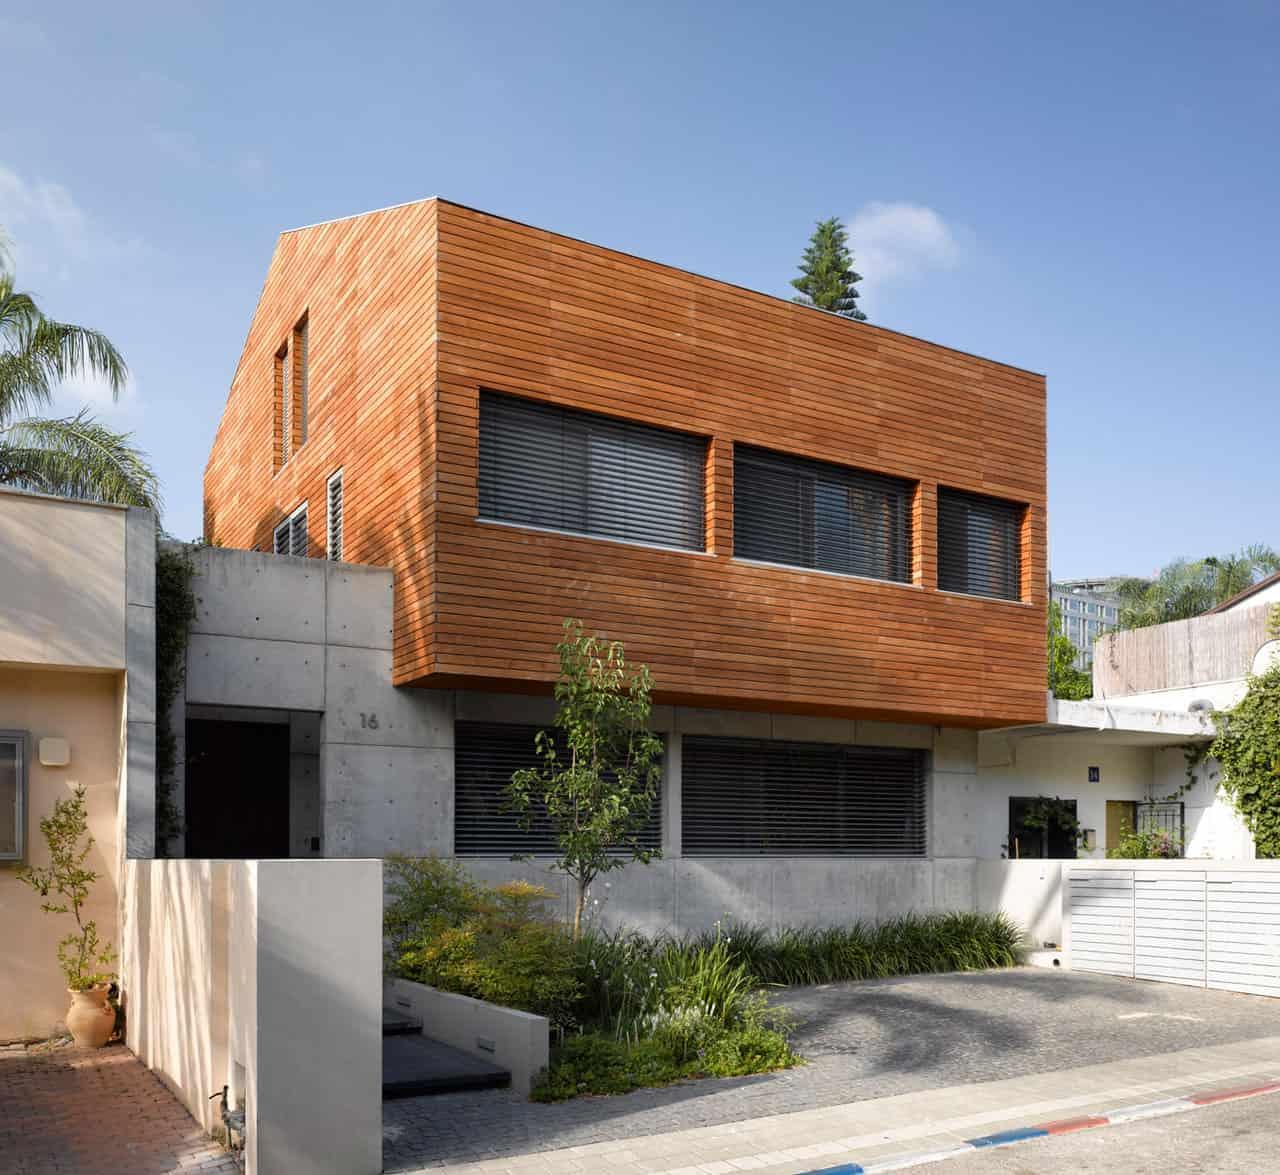 stv house by arstudio arnon nir architecture. Black Bedroom Furniture Sets. Home Design Ideas